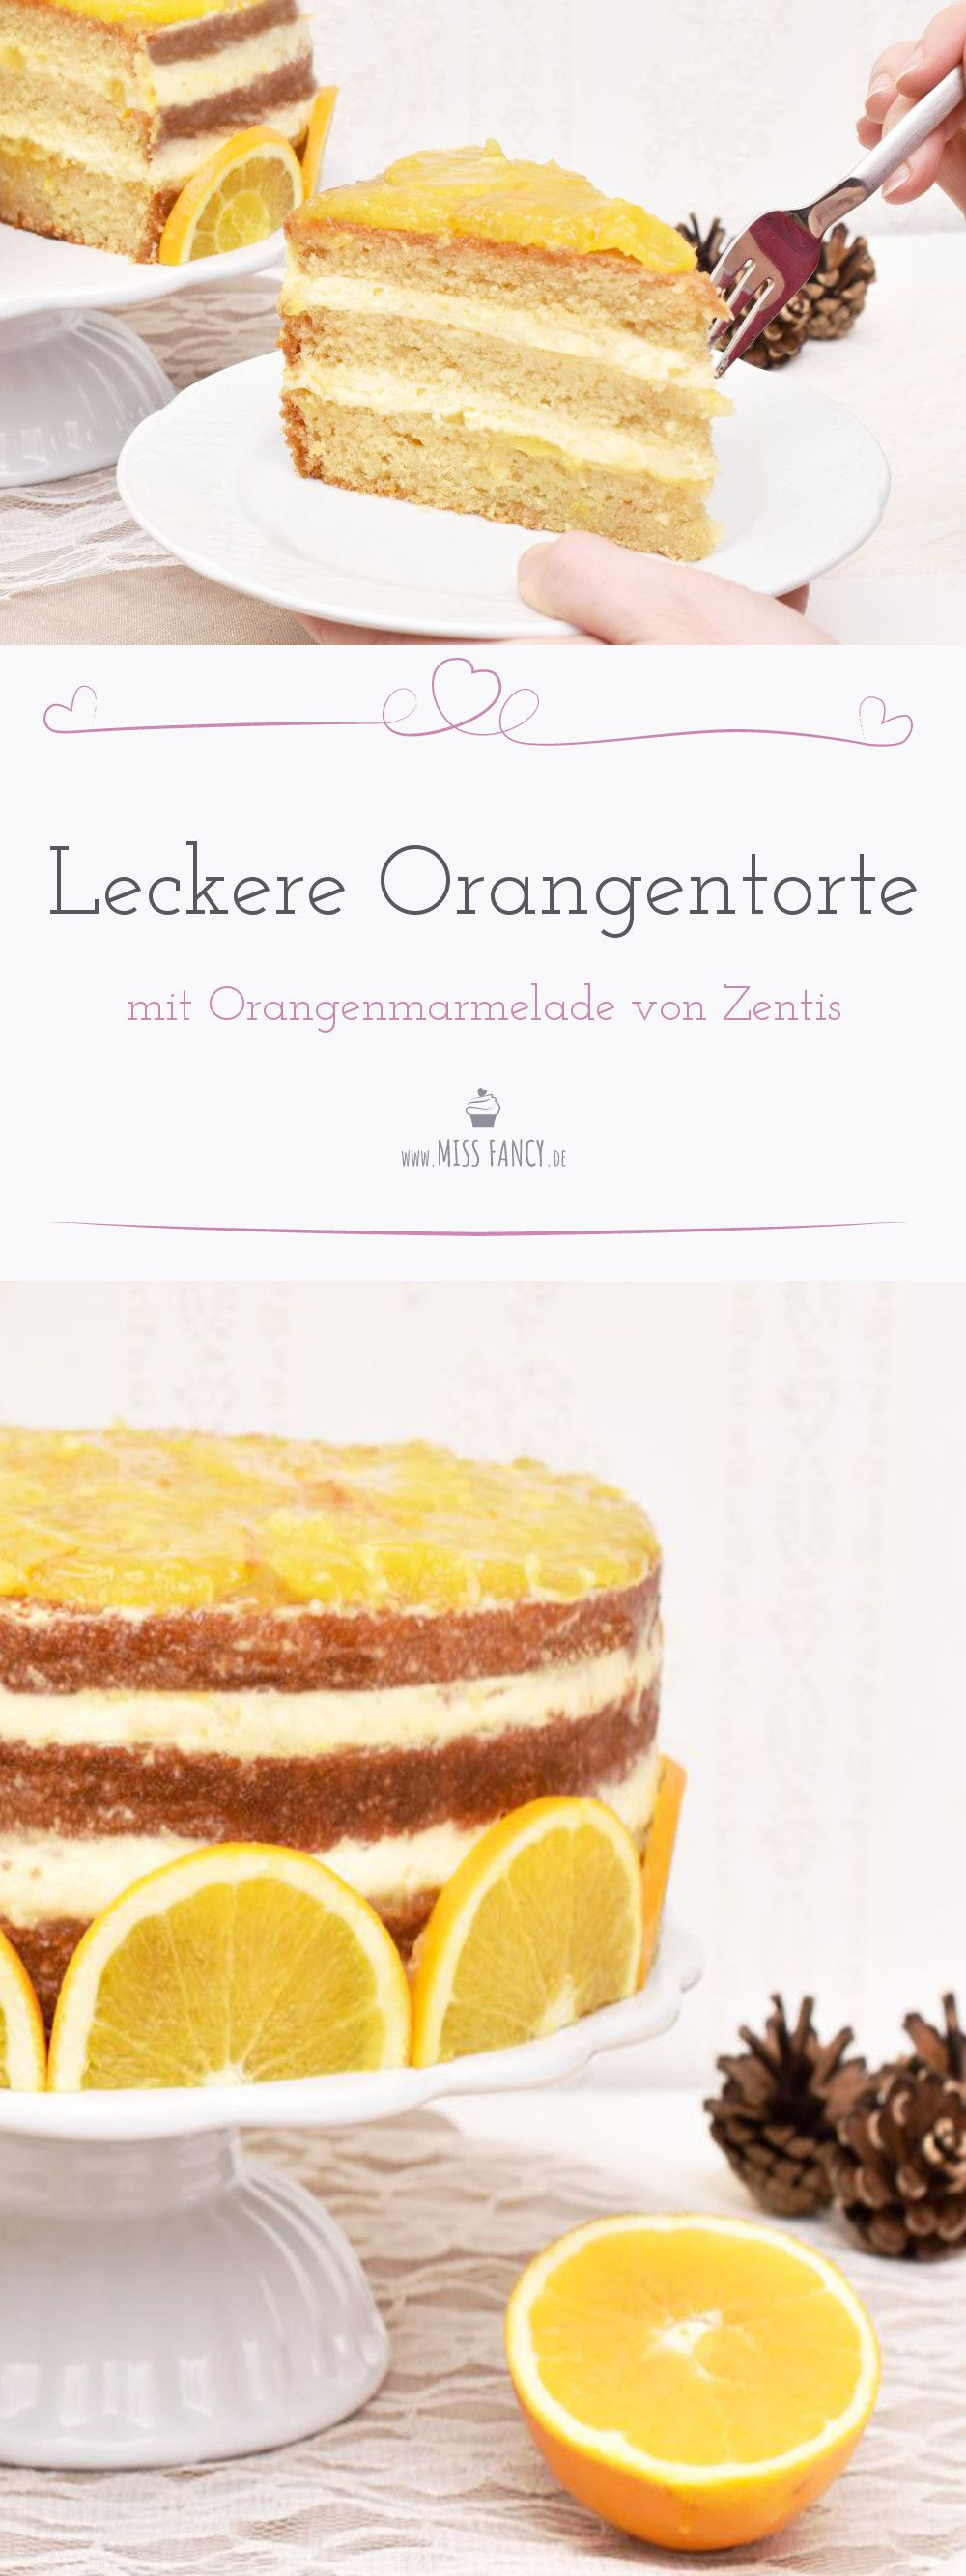 Rezept-leckere-Orangentorte-Zentis Missfancy